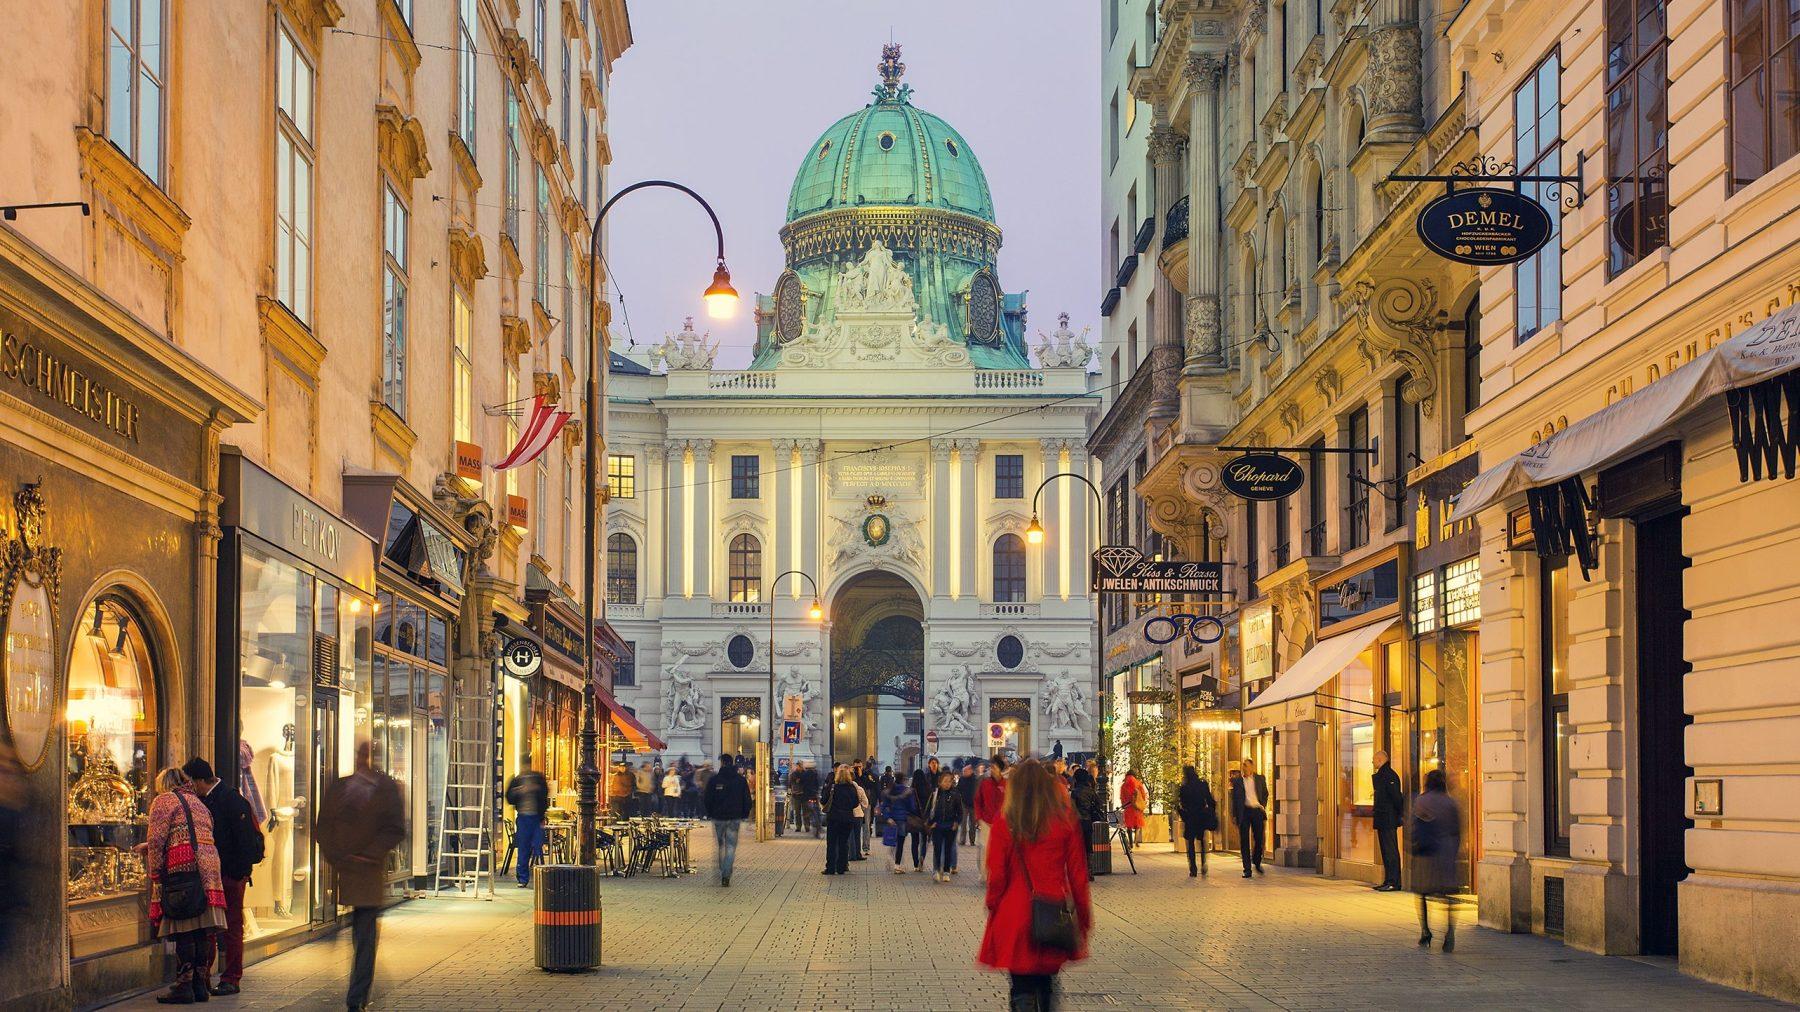 Austria (Getty Images)